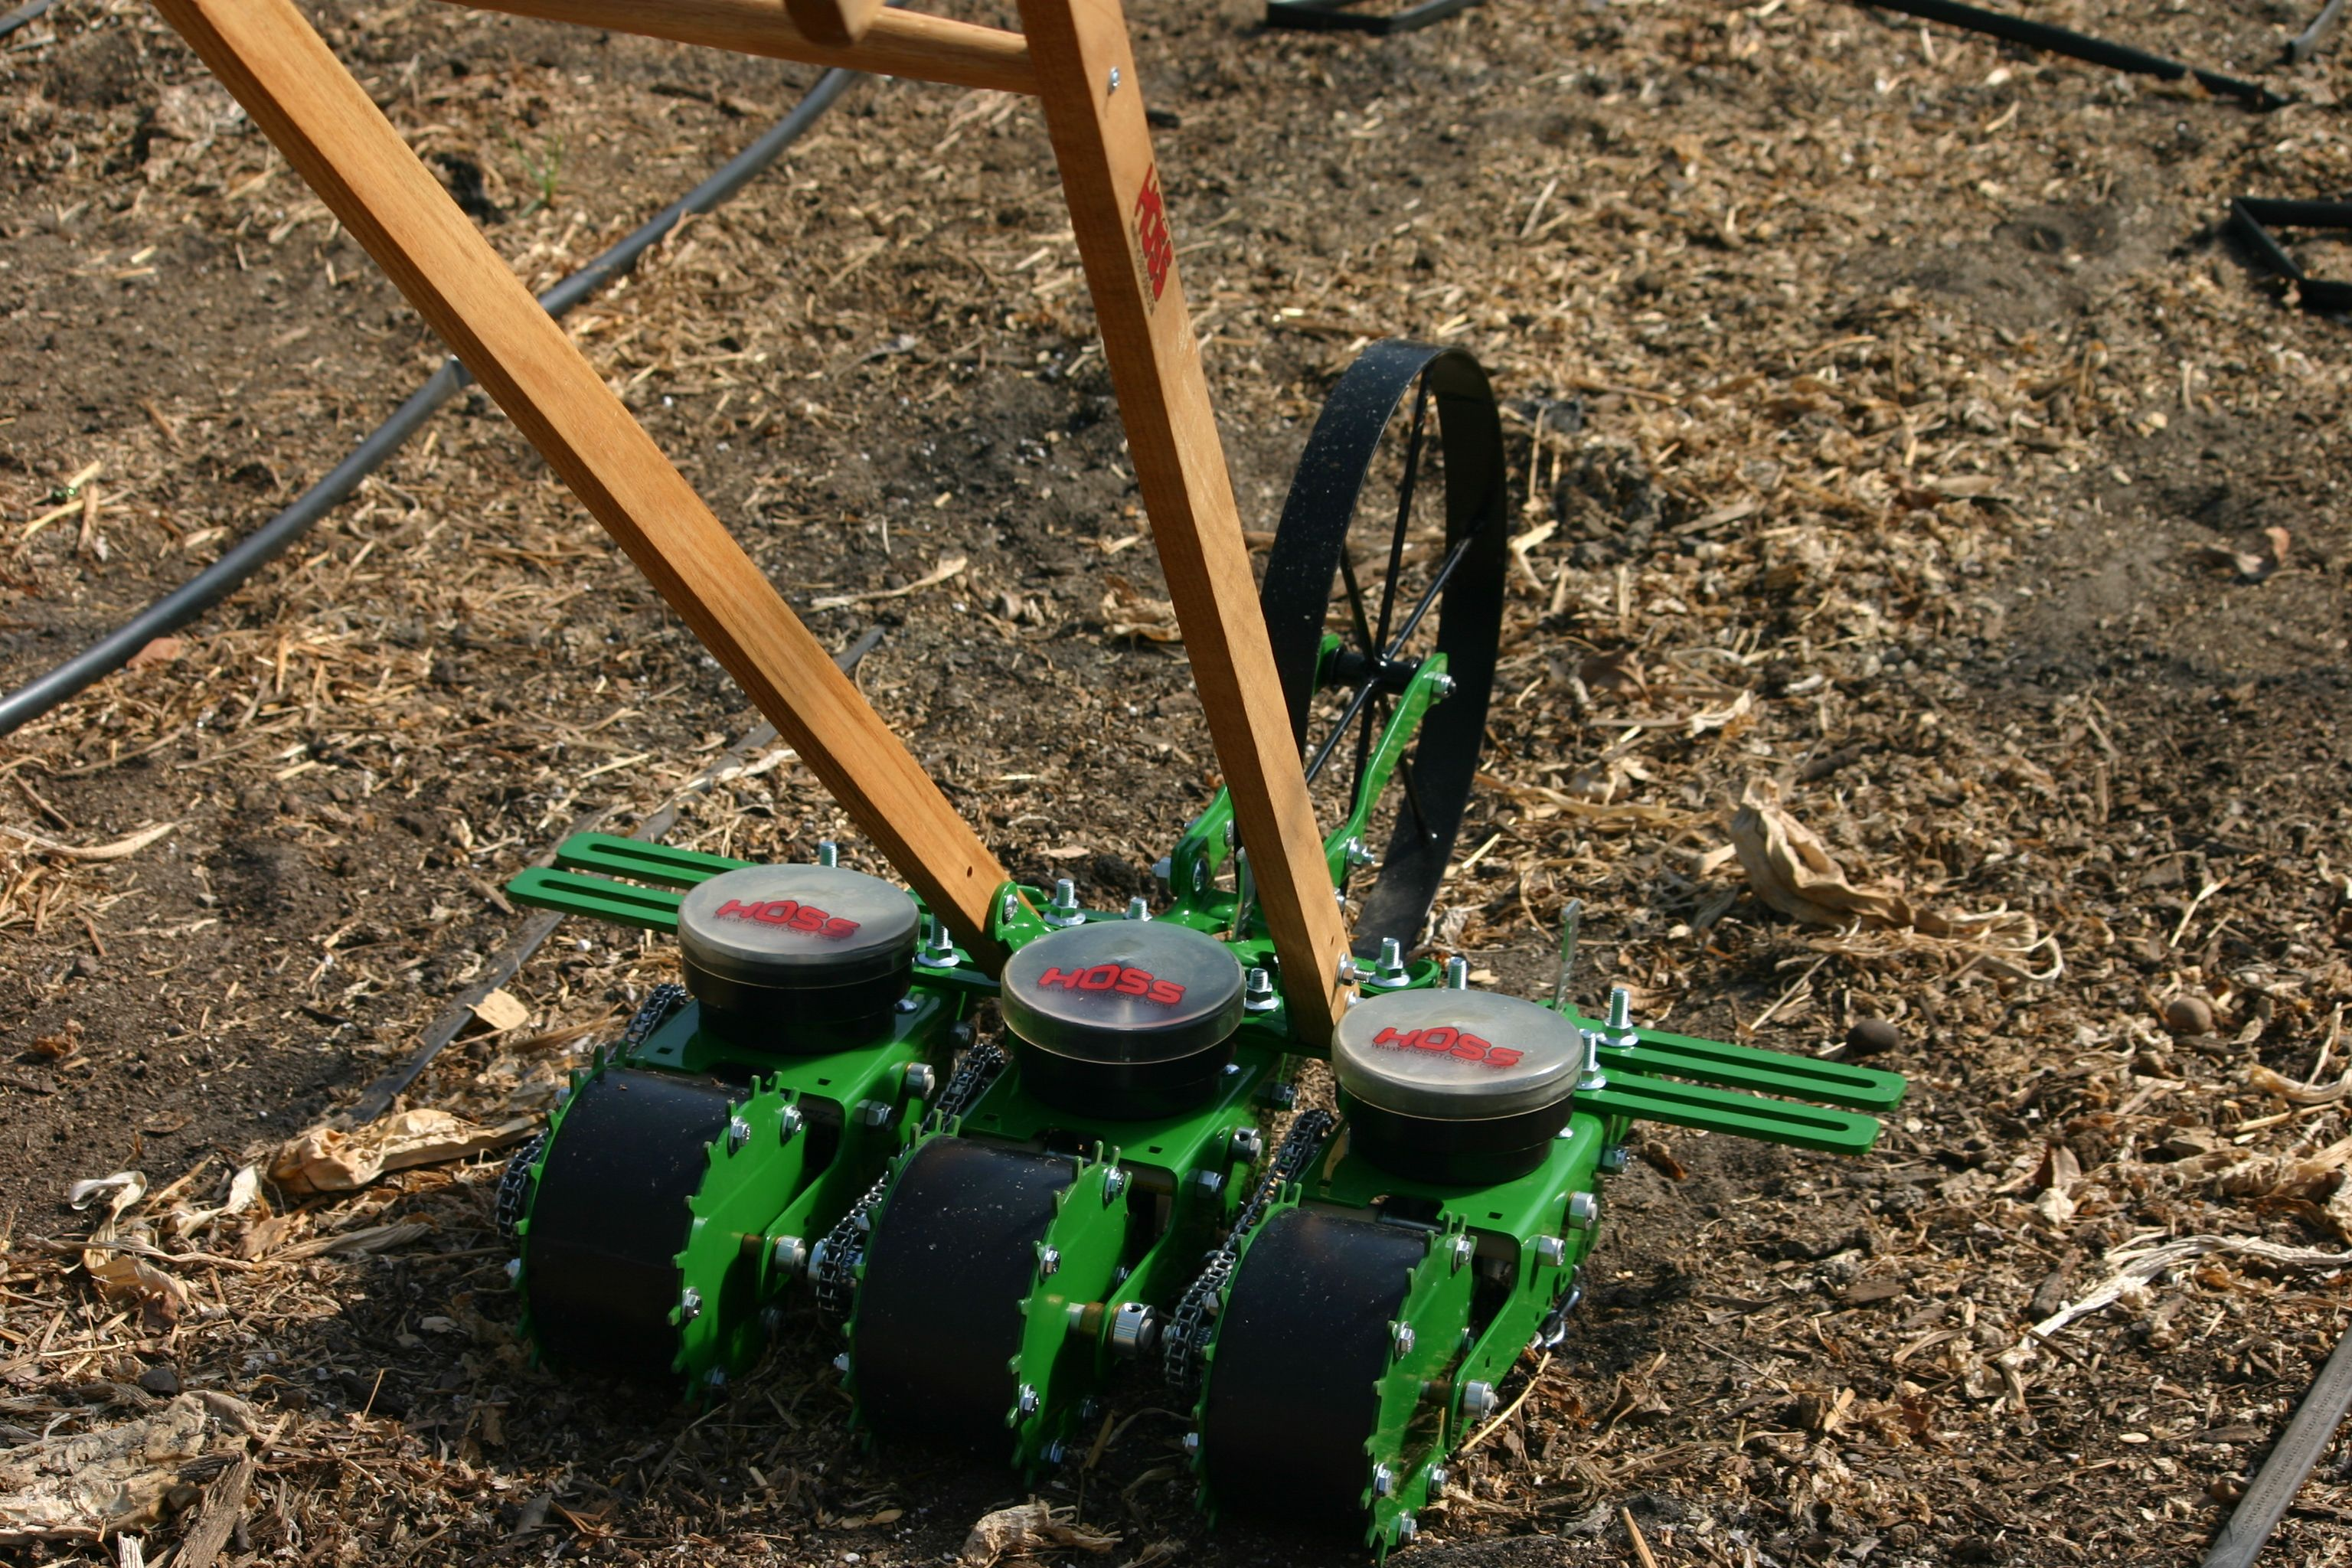 This Incredible Wheel Hoe And Seeder Setup Allows You To Plant Multiple Rows At A Time Using Four Spreader Bar Extens Home Vegetable Garden Garden Tools Garden